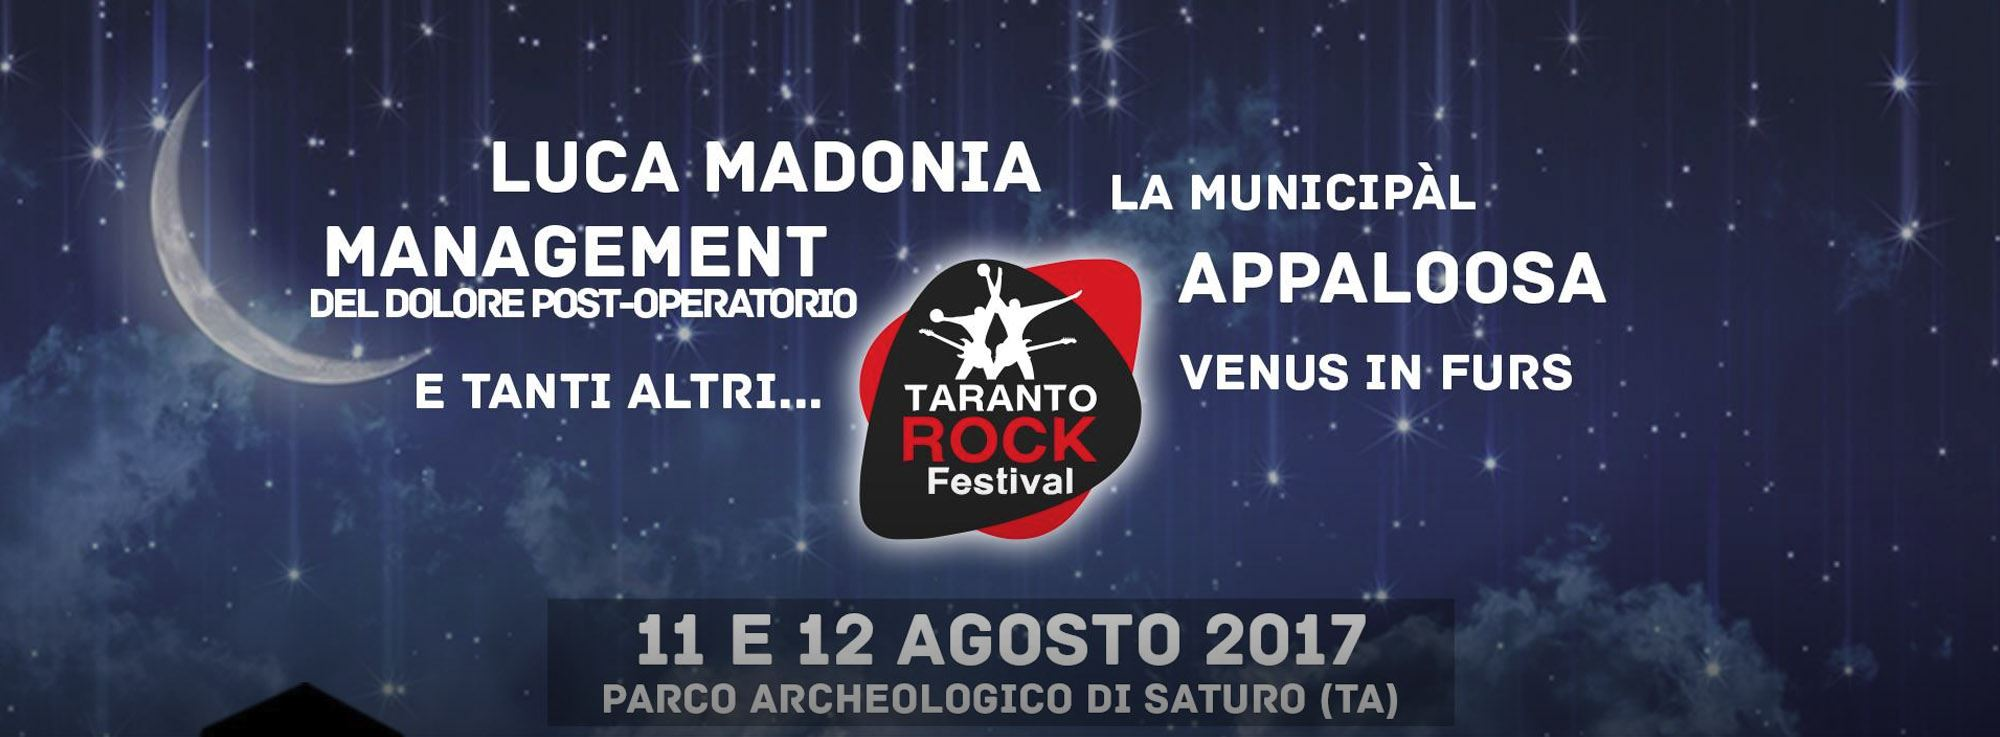 Leporano: Taranto Rock Festival